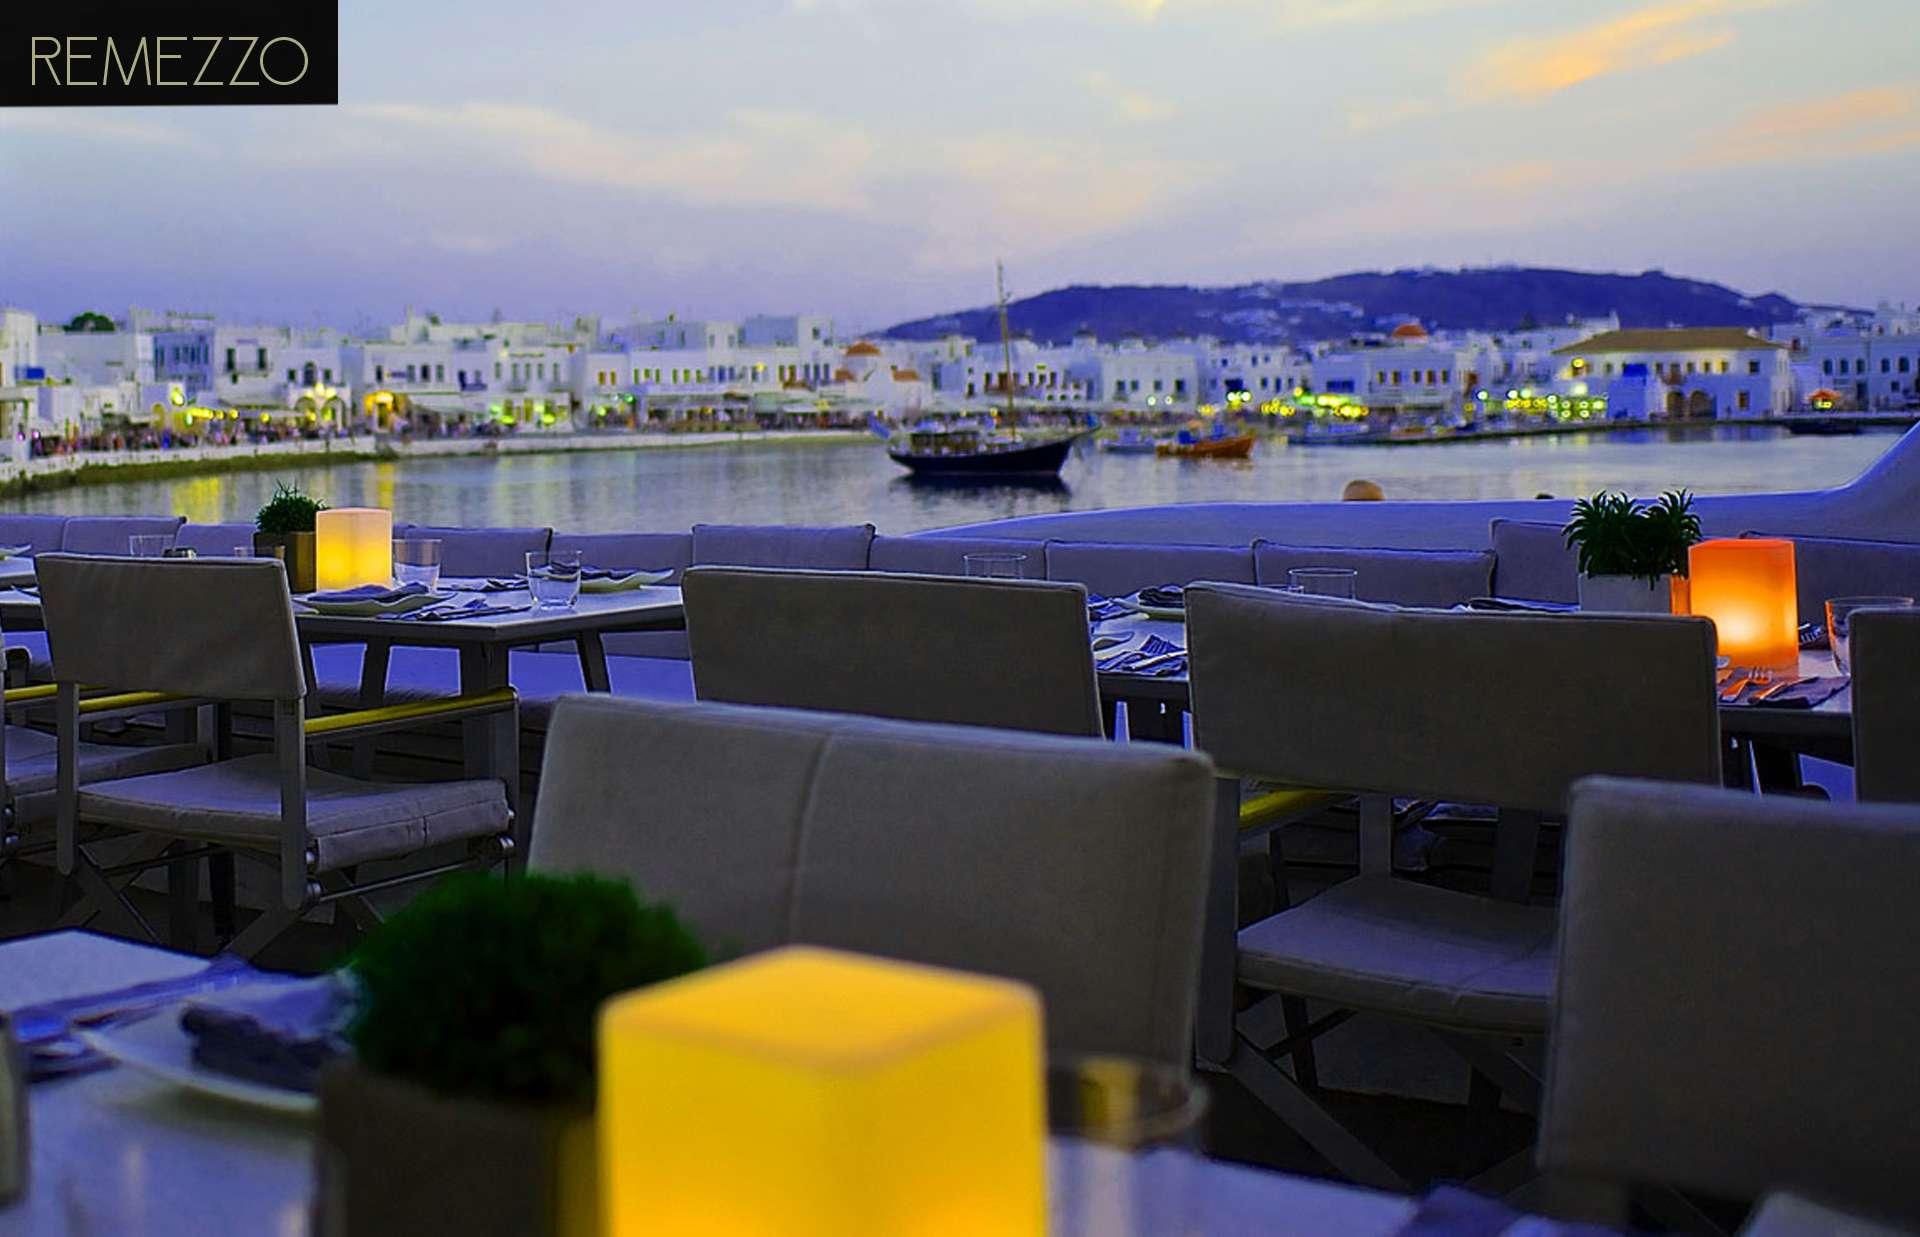 remezzo-restaurant-mykonos-restaurants